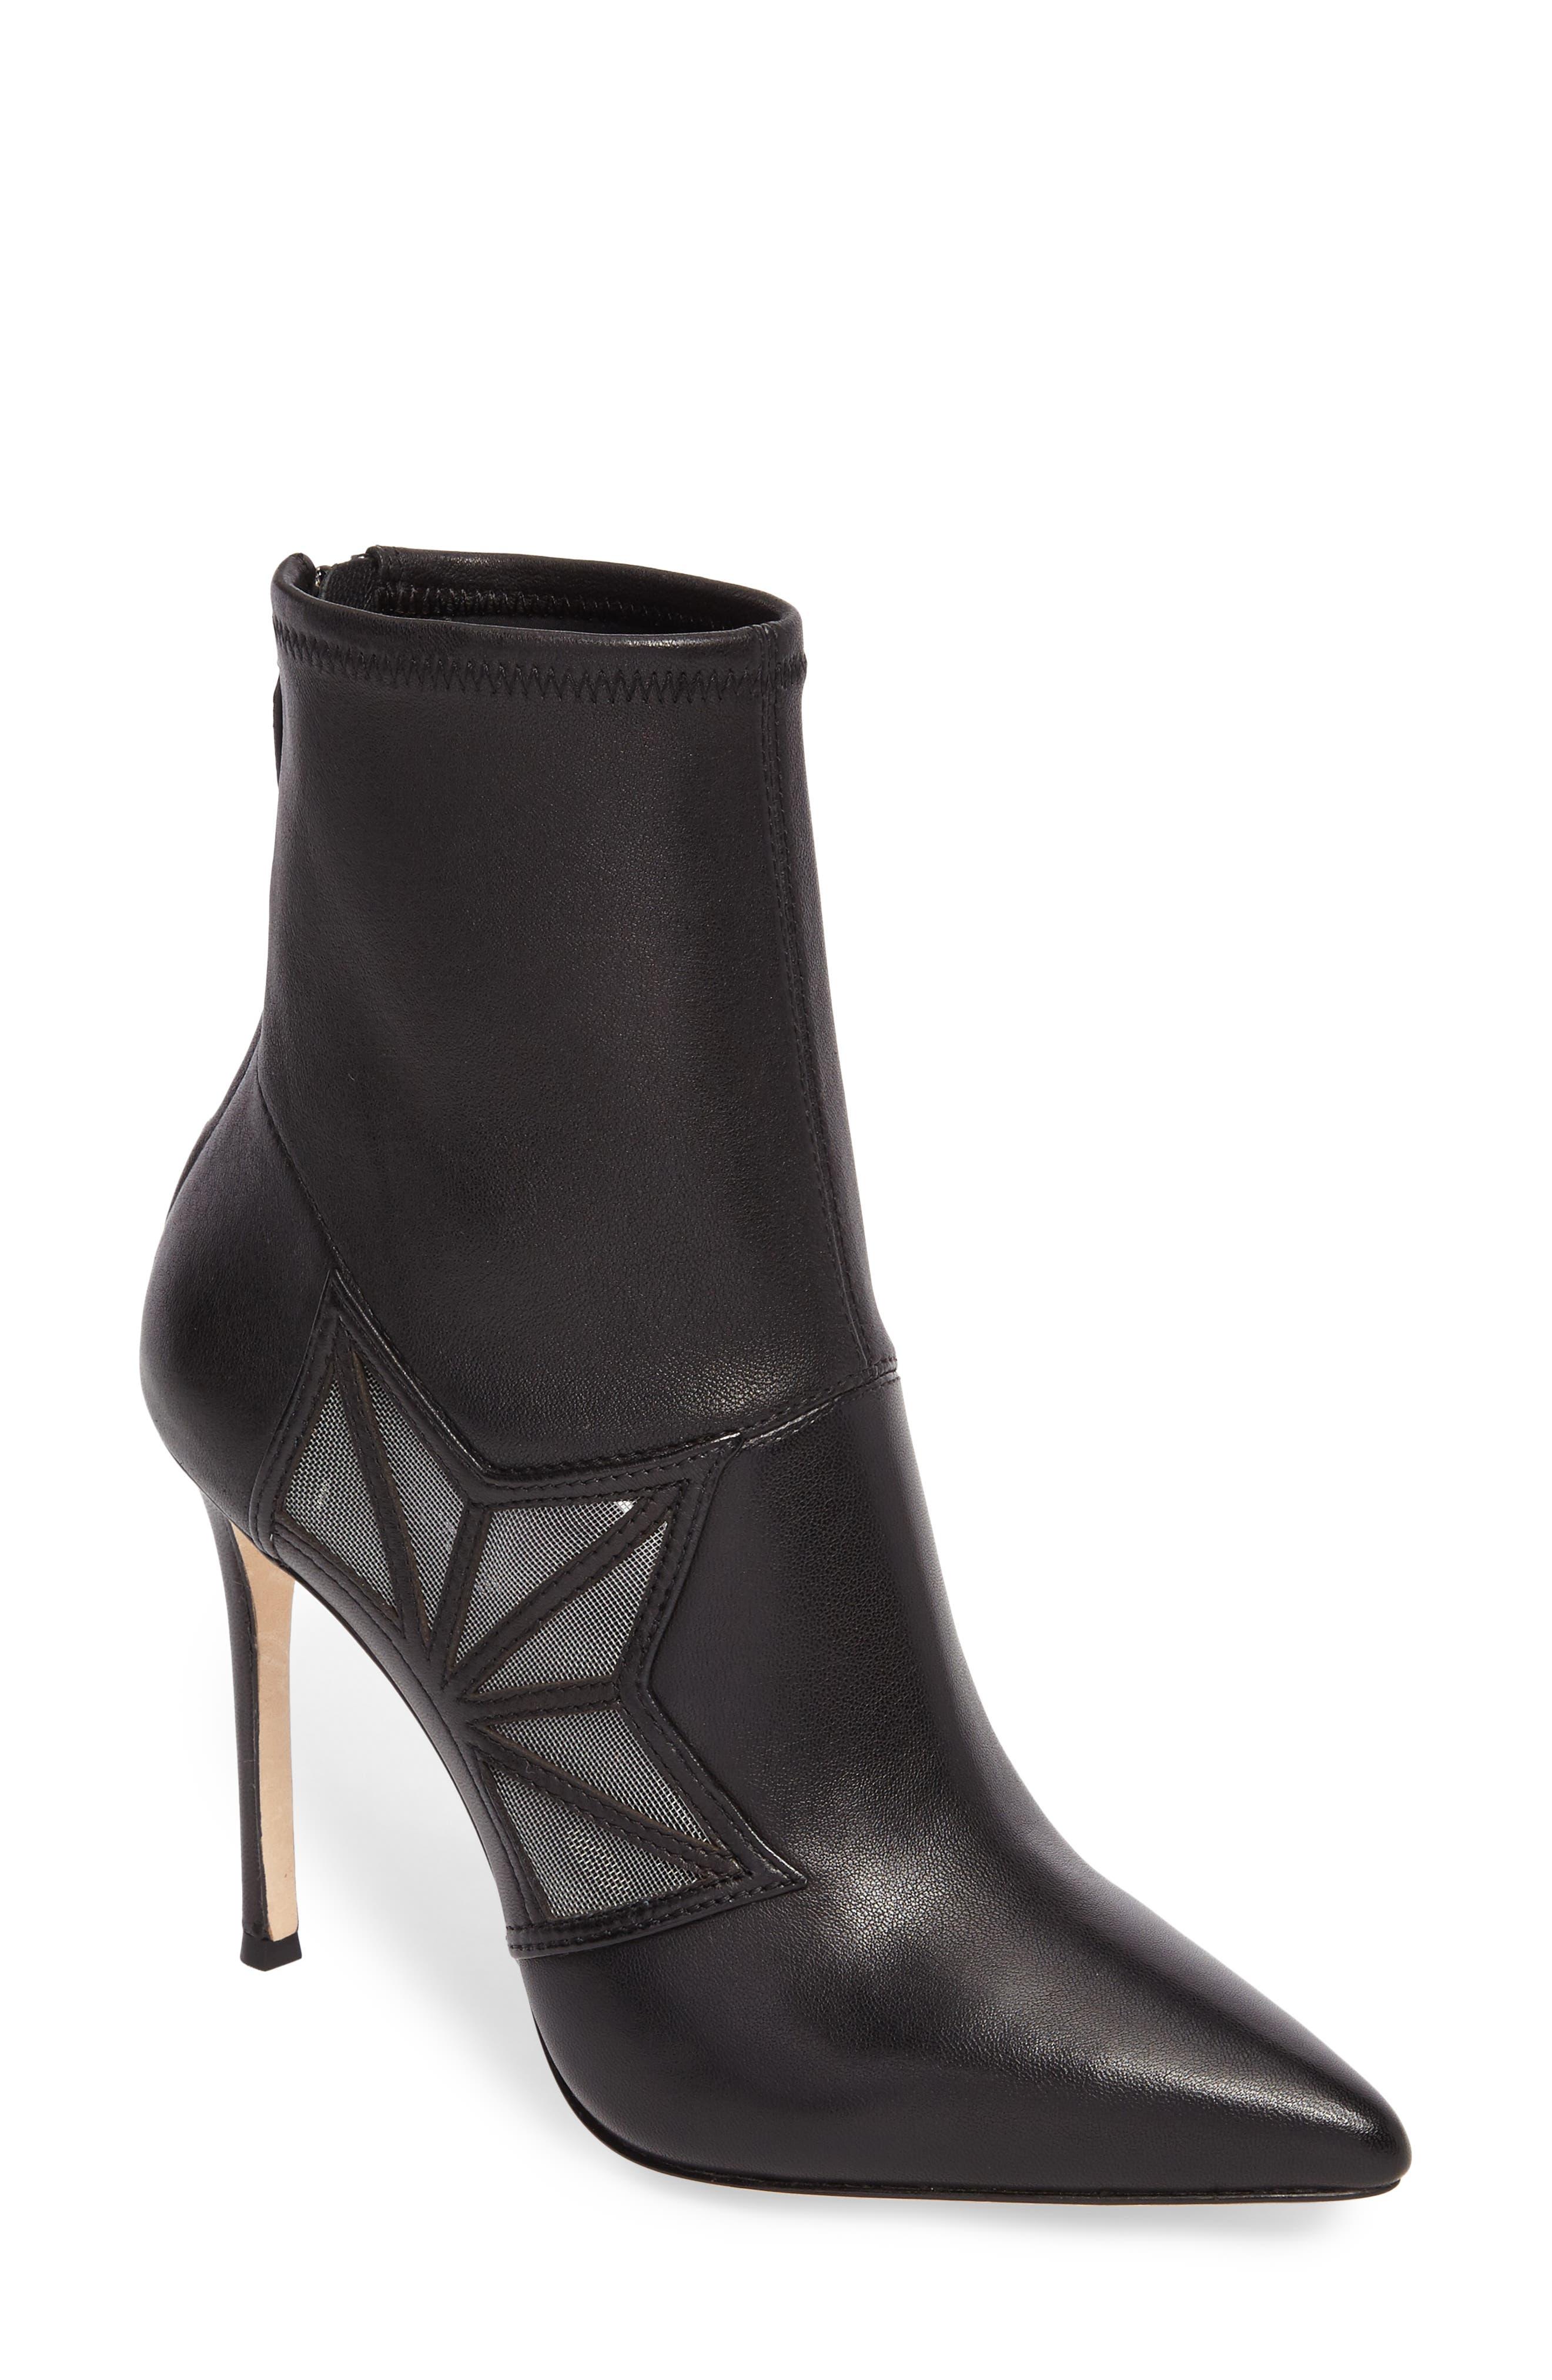 Ceara Bootie,                         Main,                         color, Black Leather